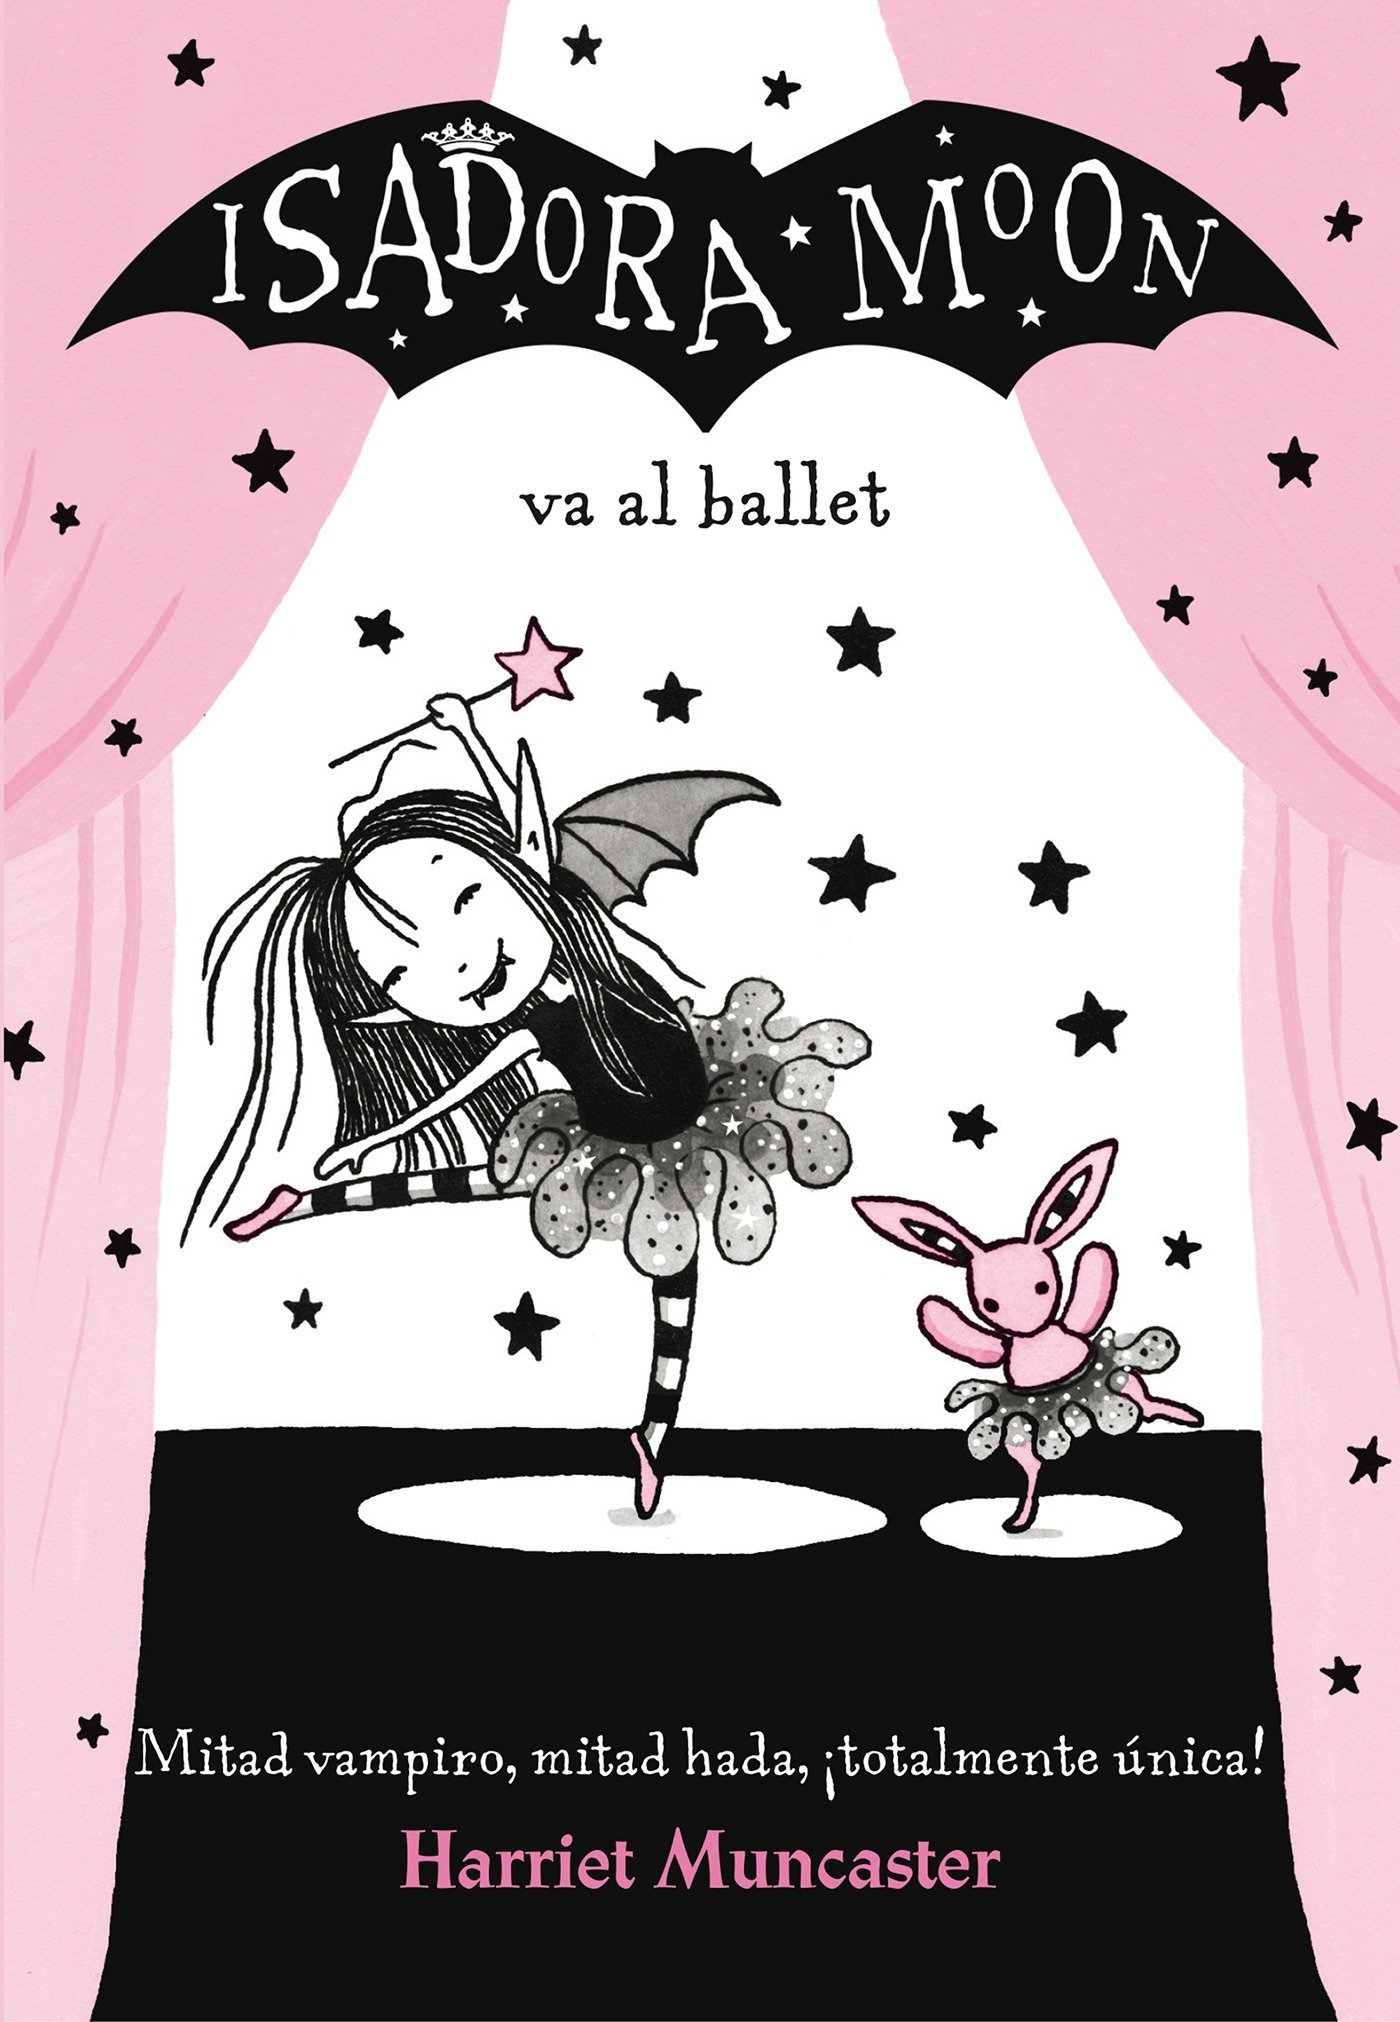 Isadora Moon va al ballet (FICCIÓN INFANTIL) - 9788420485843 Tapa blanda – 6 abr 2017 Harriet Muncaster ALFAGUARA 8420485845 Ballet;Fiction.